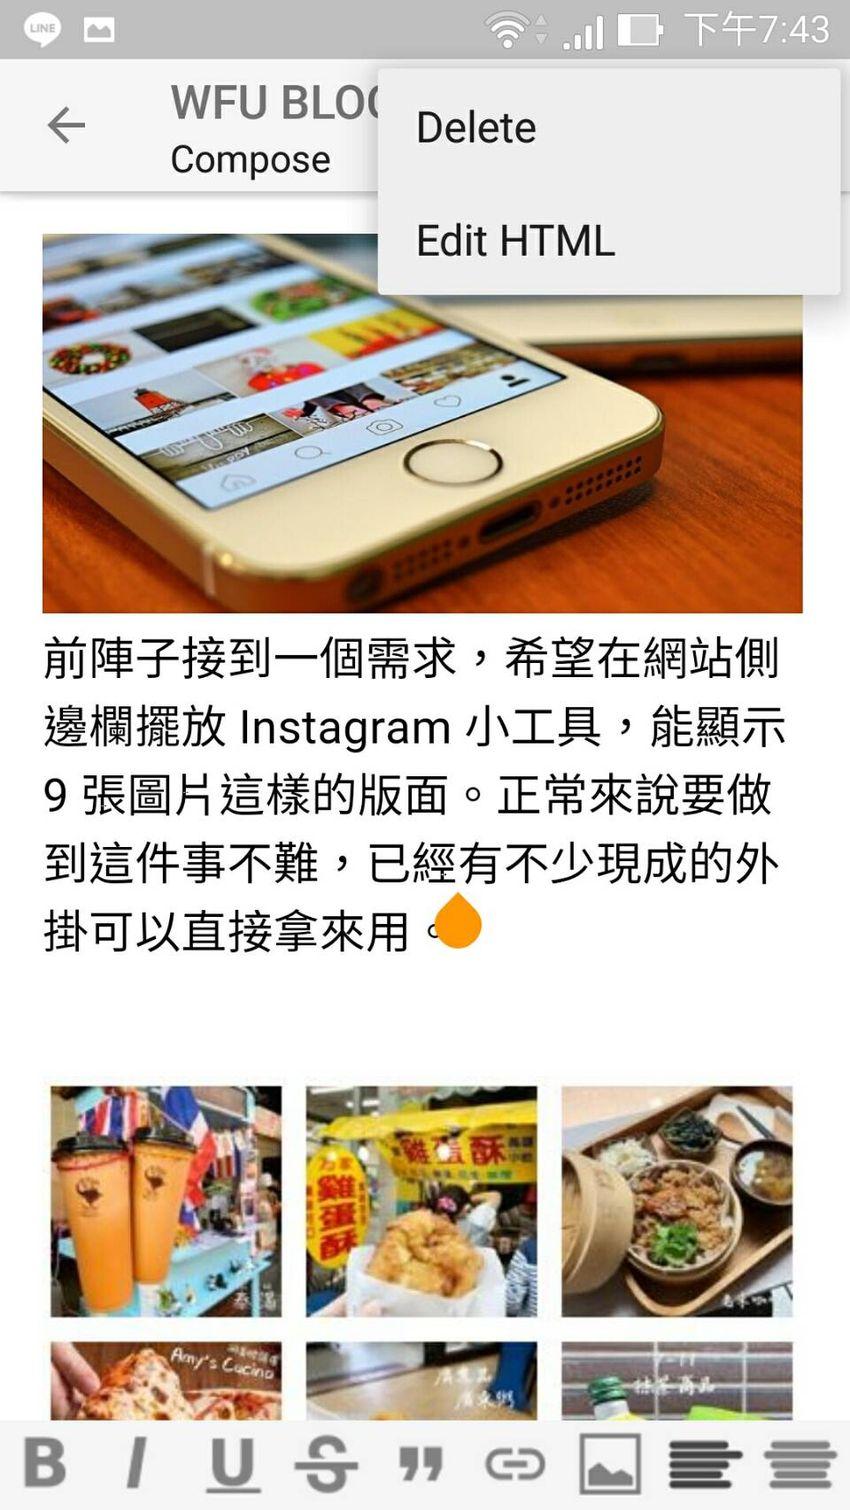 blogger-android-app-publish-post-5.jpg-Blogger 可以在行動裝置發佈文章+上傳圖片的 APP 整理